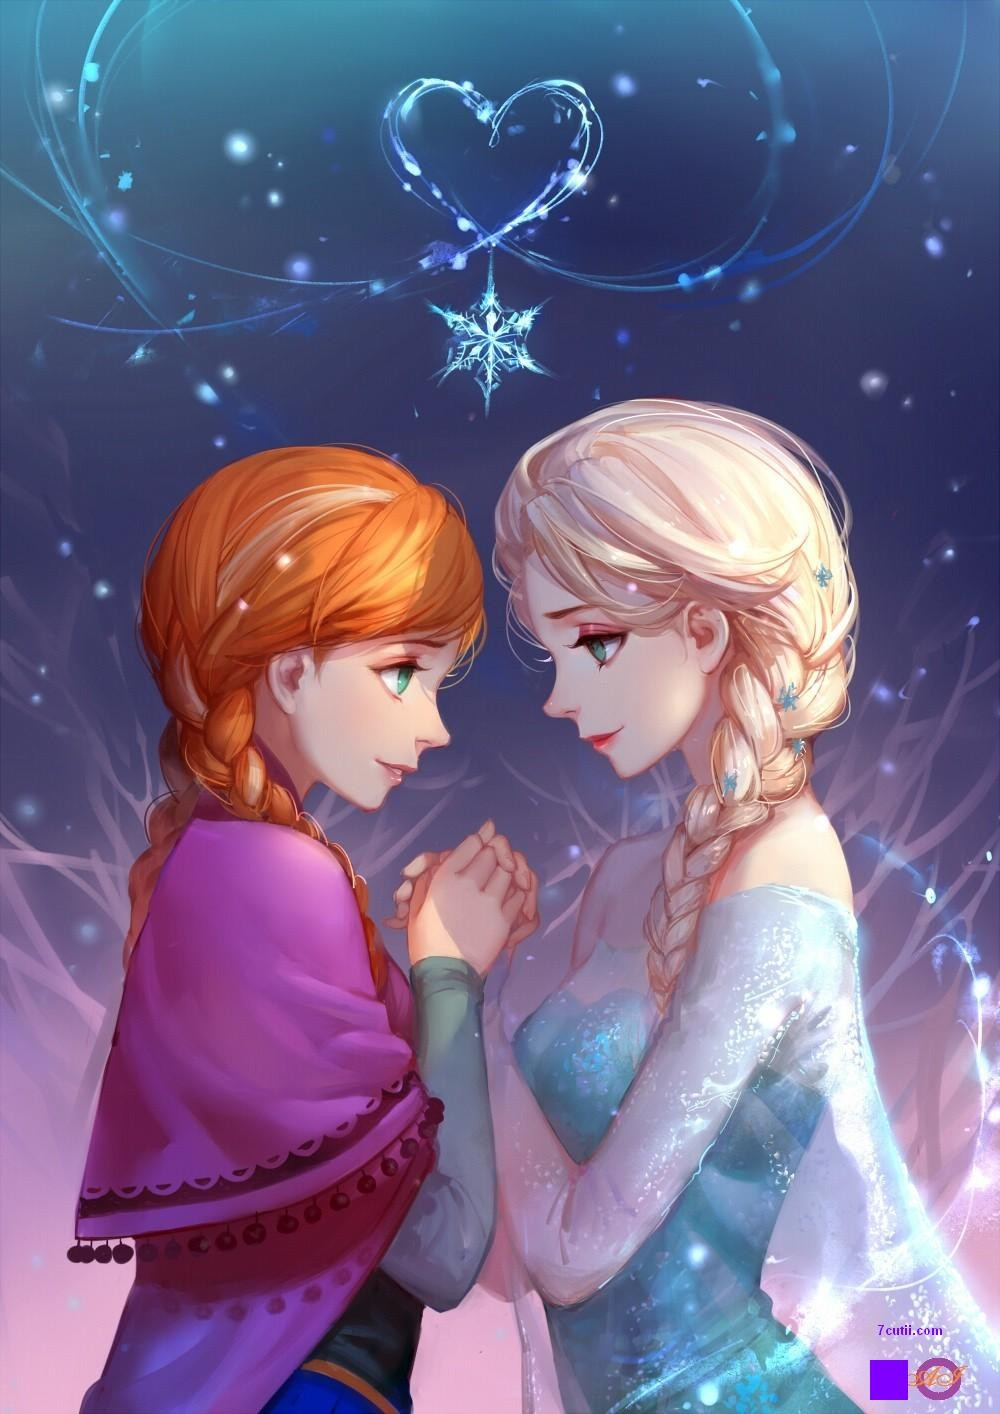 Goblen de diamante - Elsa si Anna pentru totdeauna - Frozen: Dimensiuni si tip - 25x20 cm Margele Rotunde (Circulare)